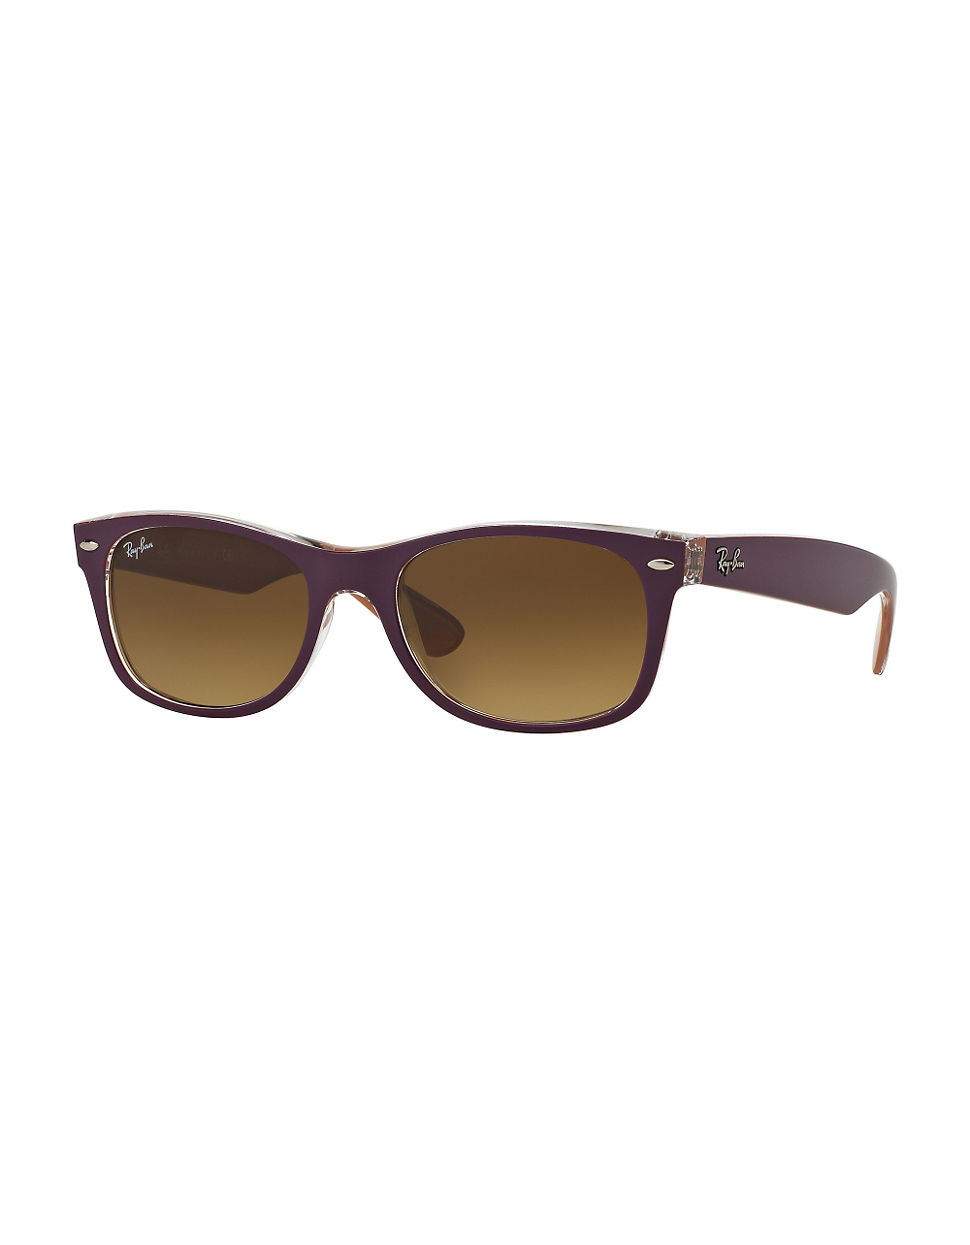 8956e067a1 Tj Maxx Polarized Sunglasses « Heritage Malta